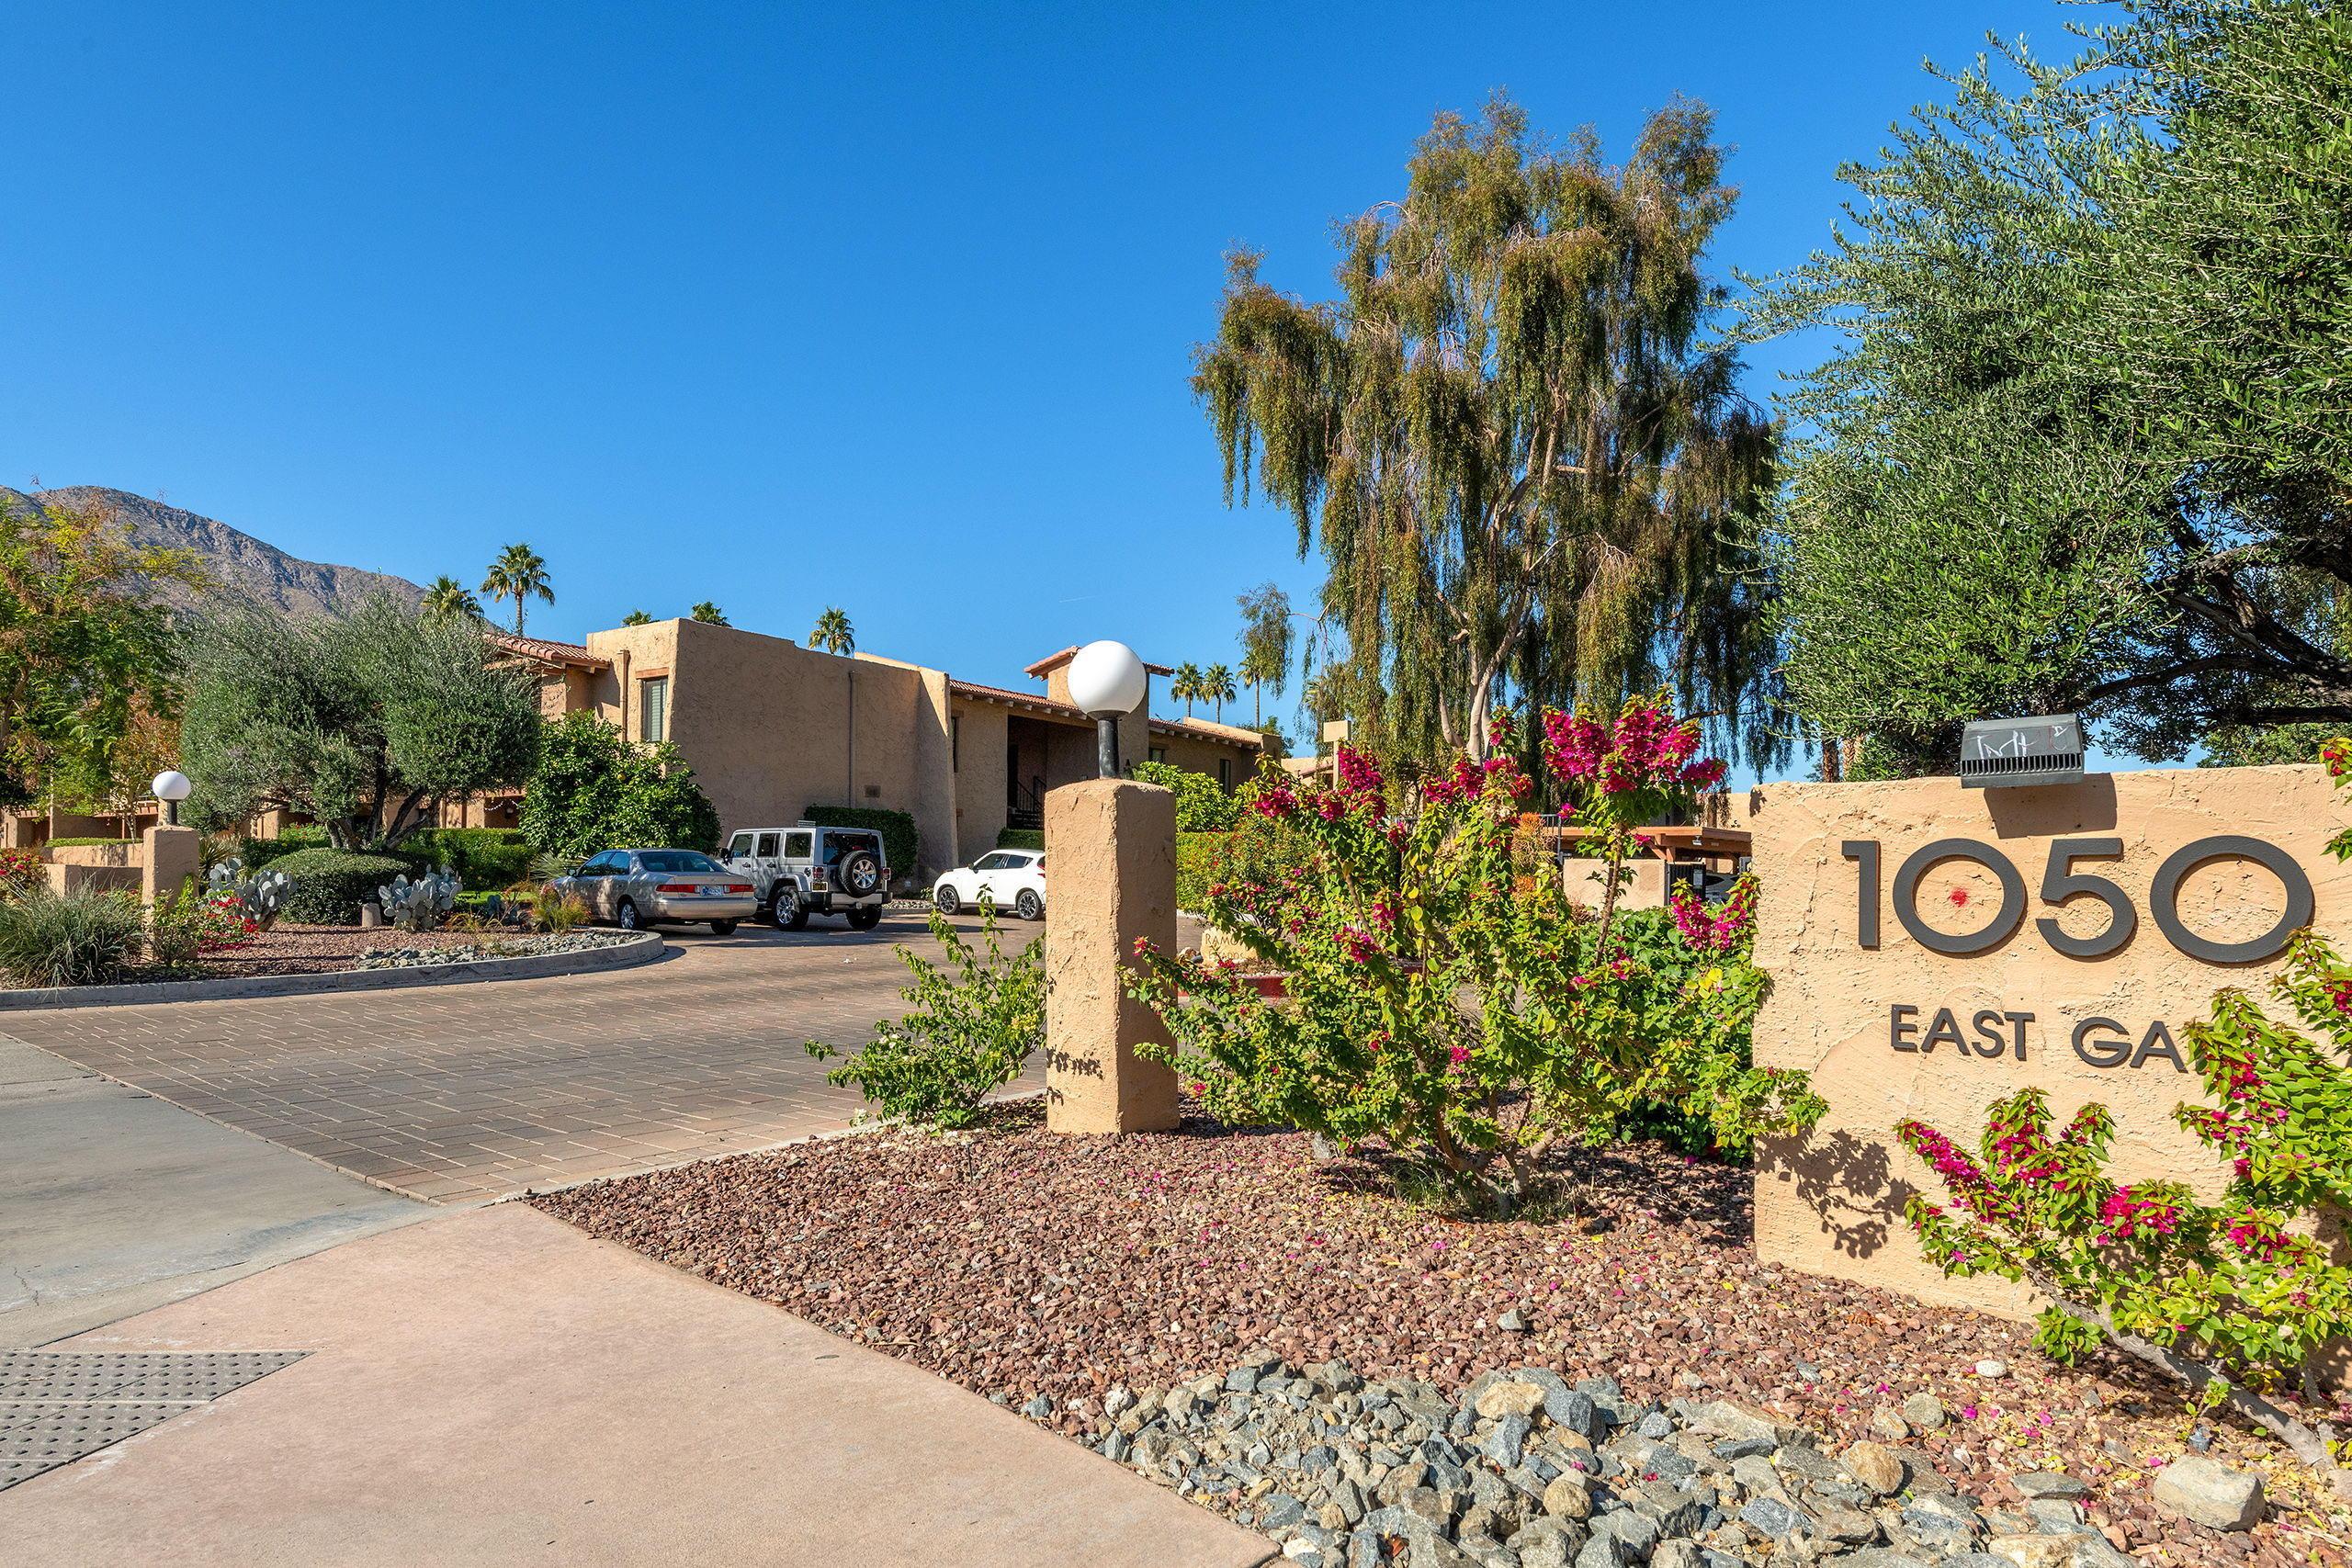 1050 E Ramon Road, Palm Springs, California 92264, 3 Bedrooms Bedrooms, ,2 BathroomsBathrooms,Residential,For Sale,1050 E Ramon Road,219035293